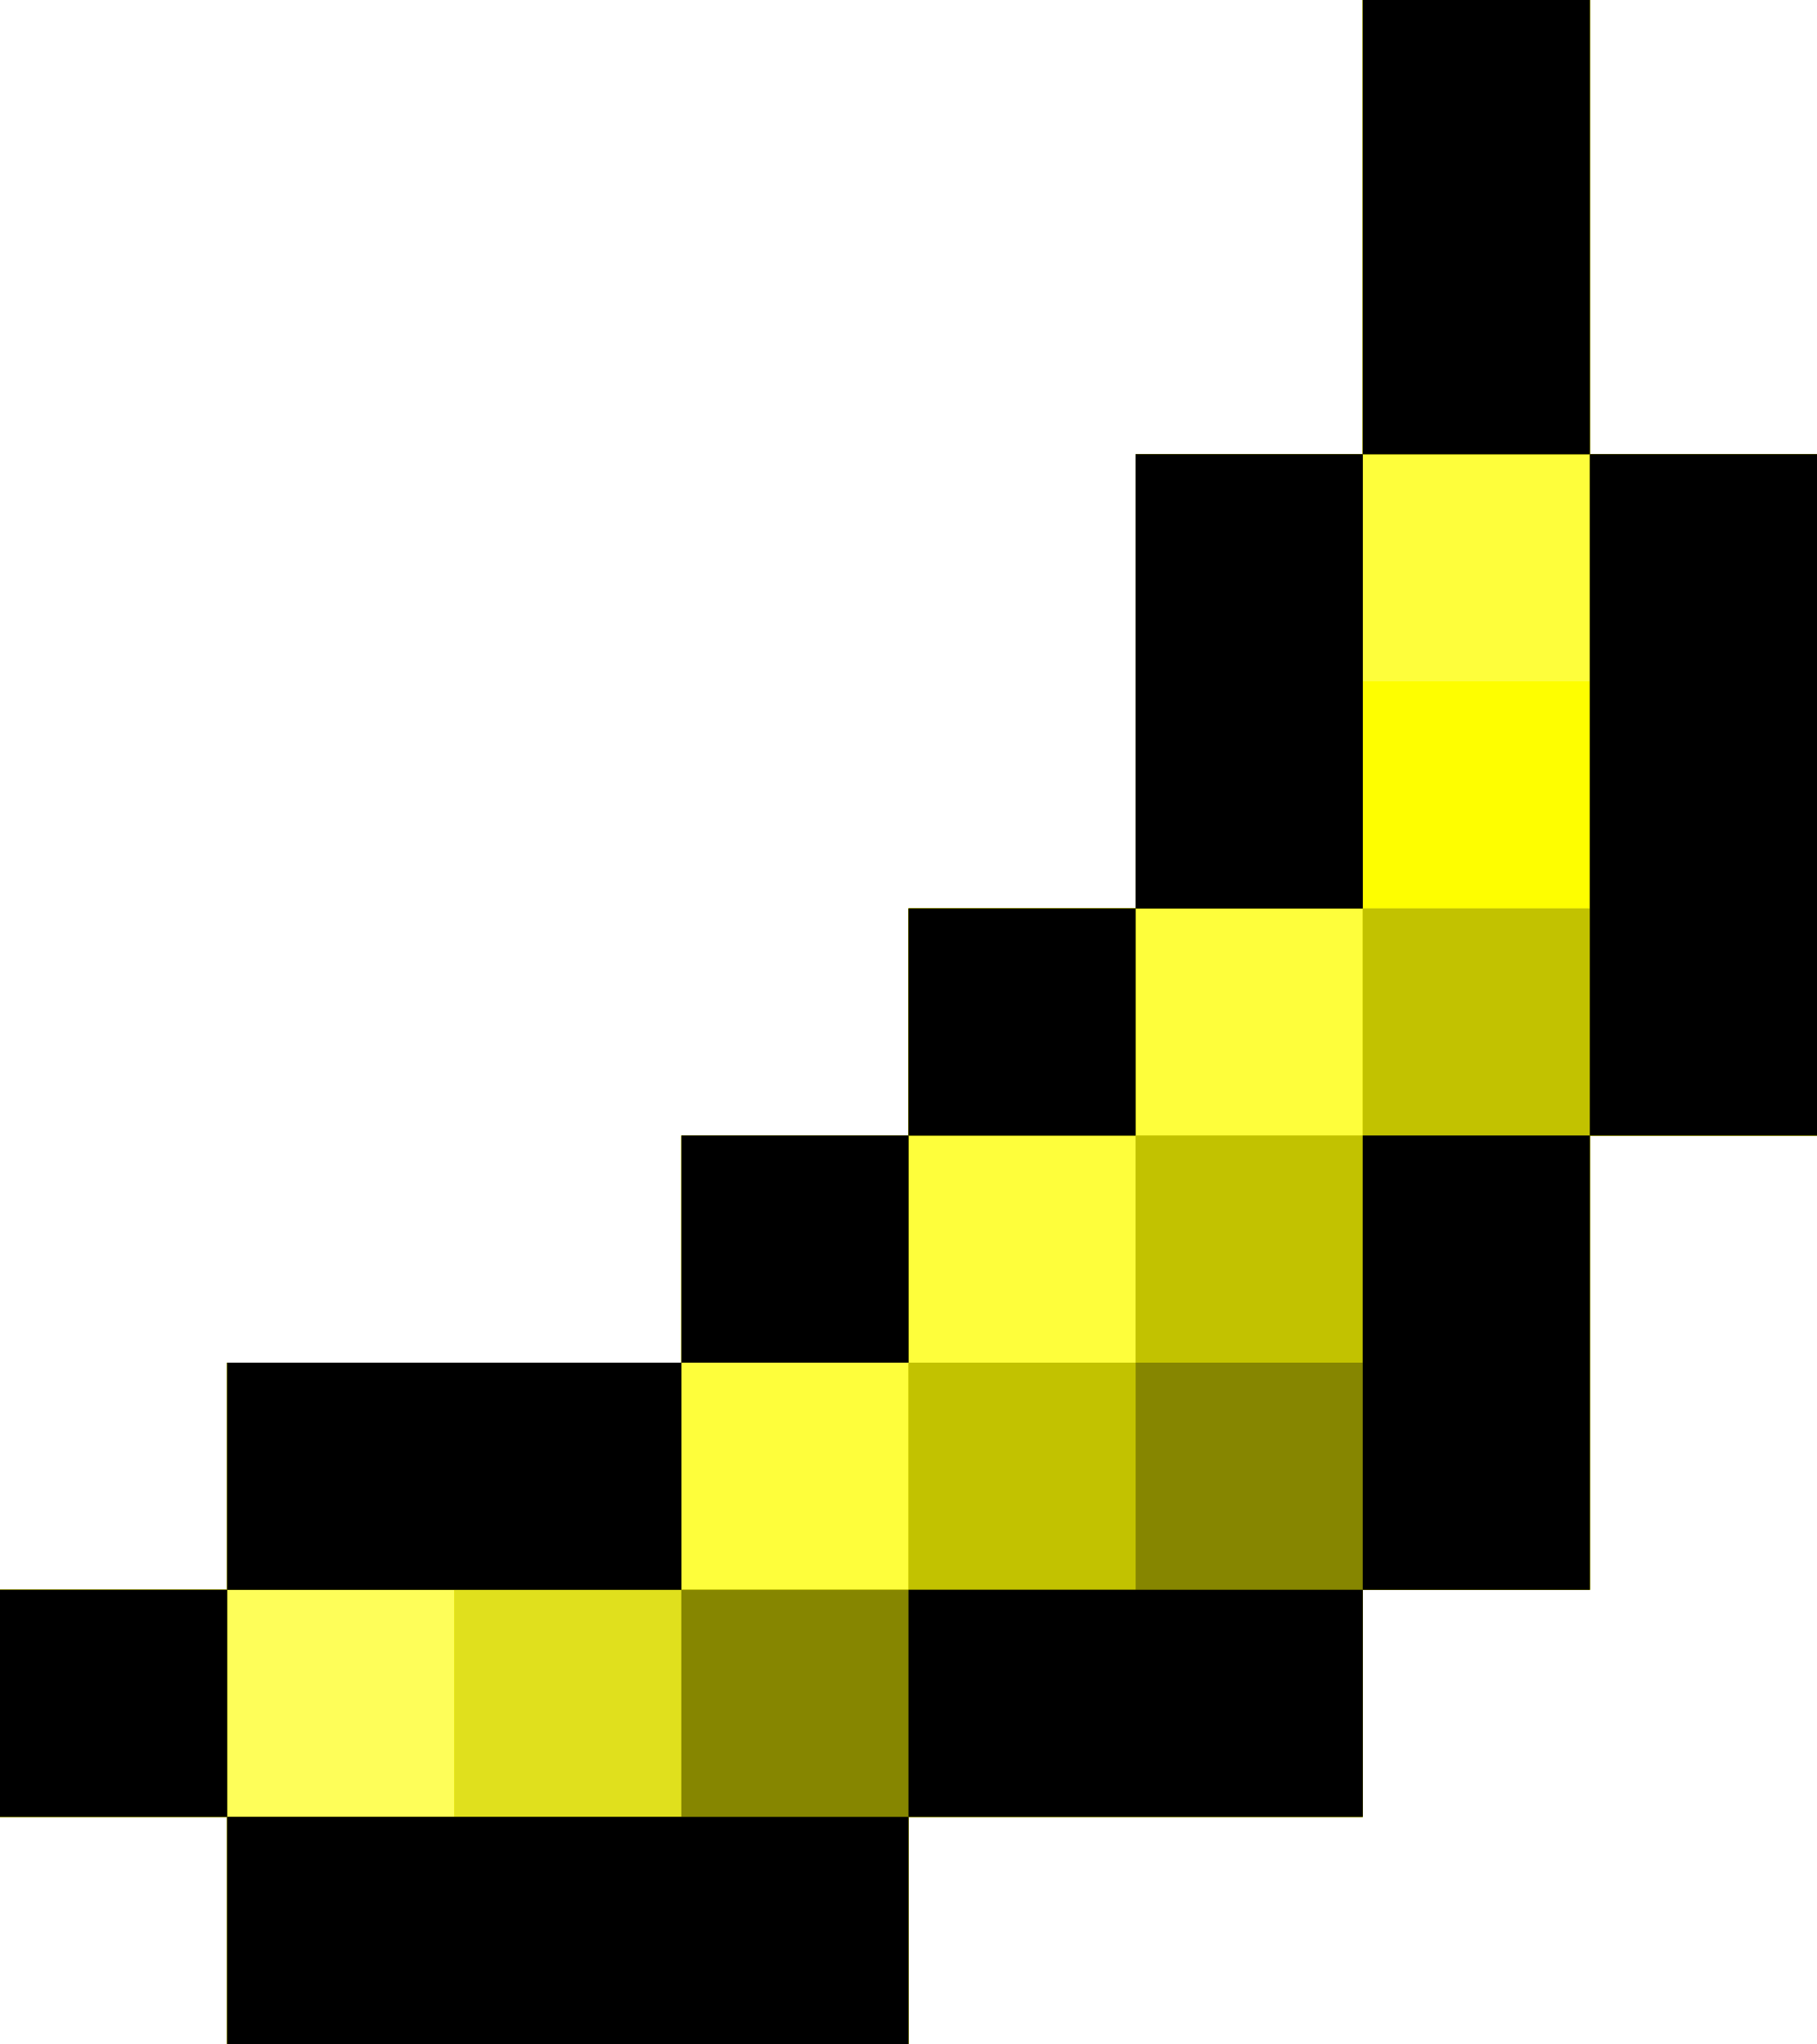 Pixel clipart banana Banana Clipart Pixel by isaiah658